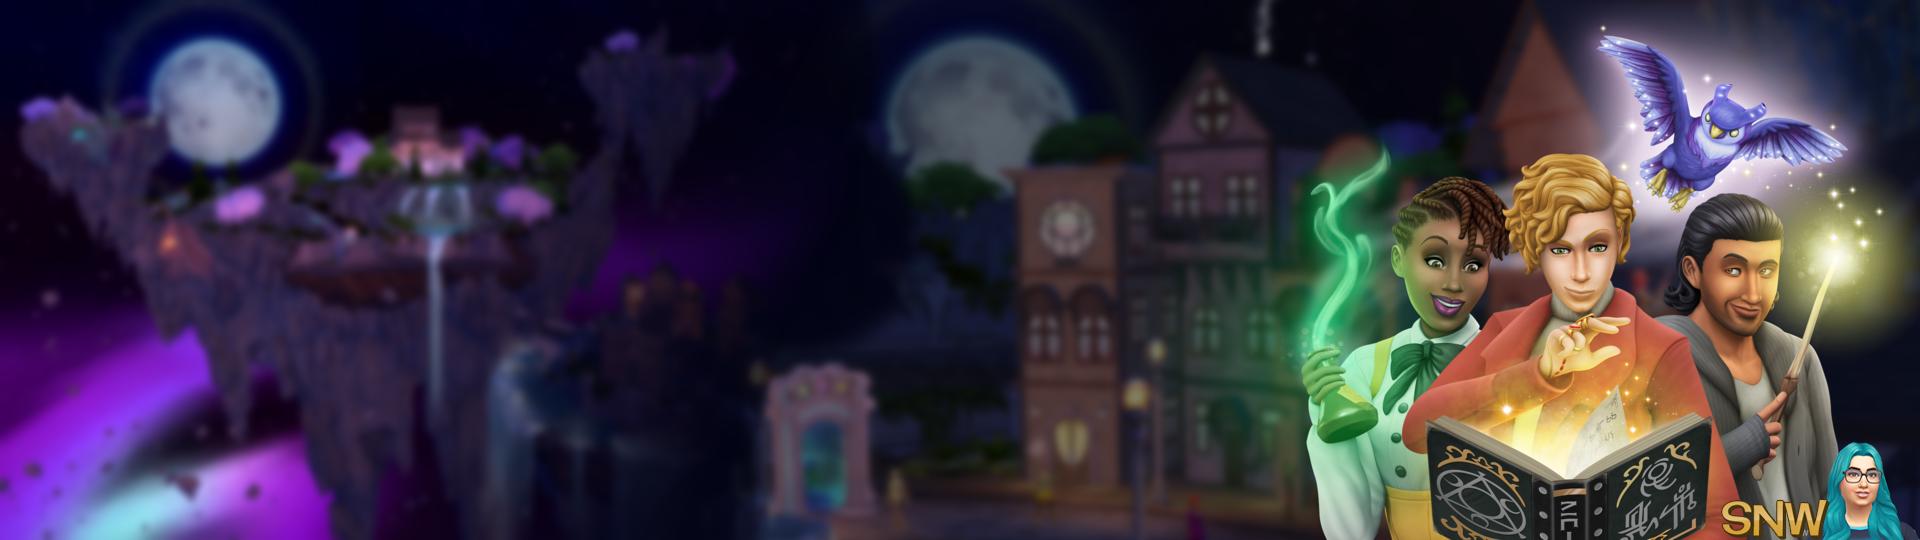 The Sims 4: Realm of Magic 5120x1440 dual screen wallpaper